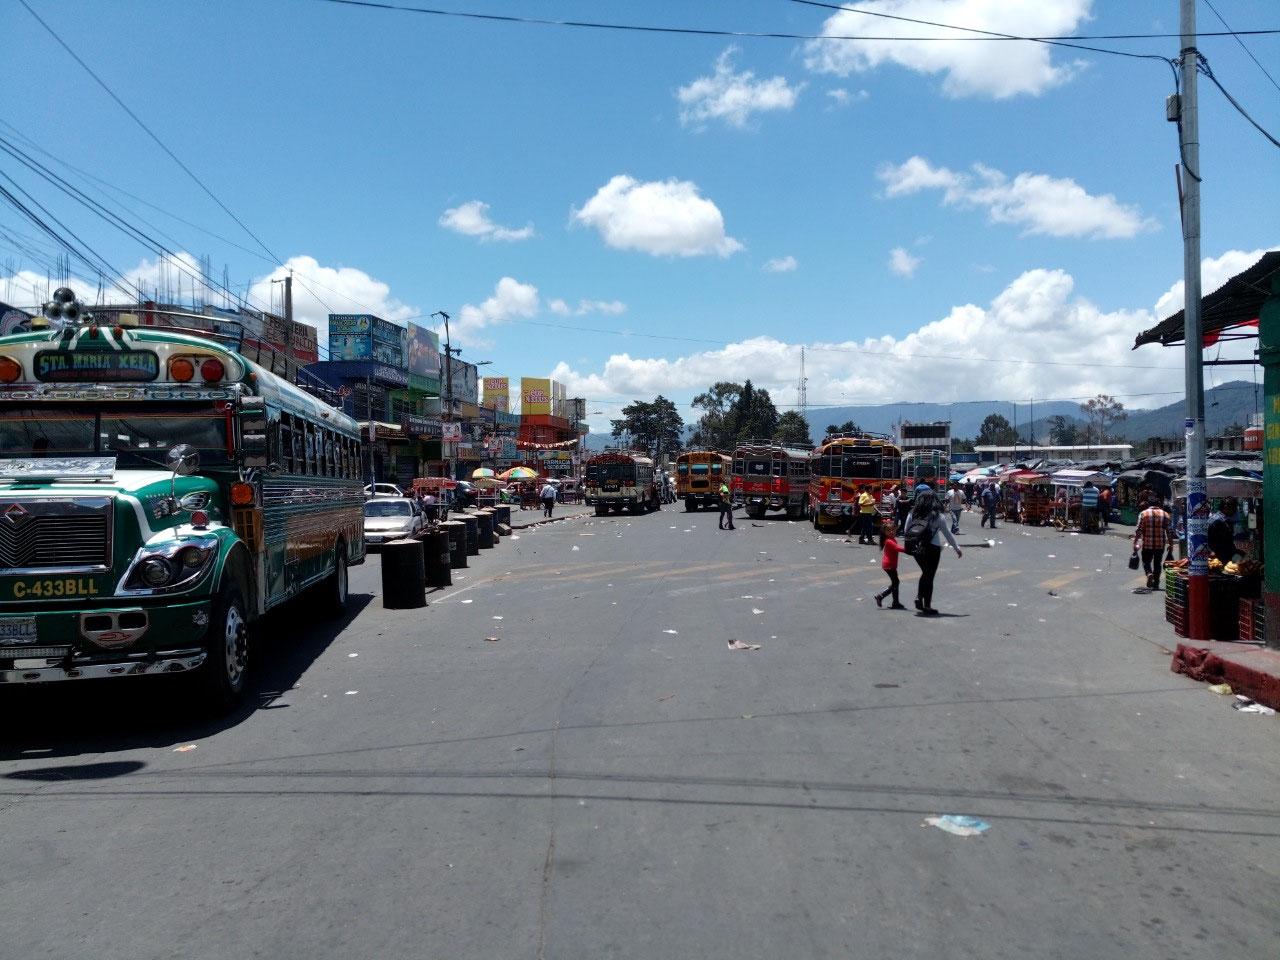 typical Latin American 'terminal'